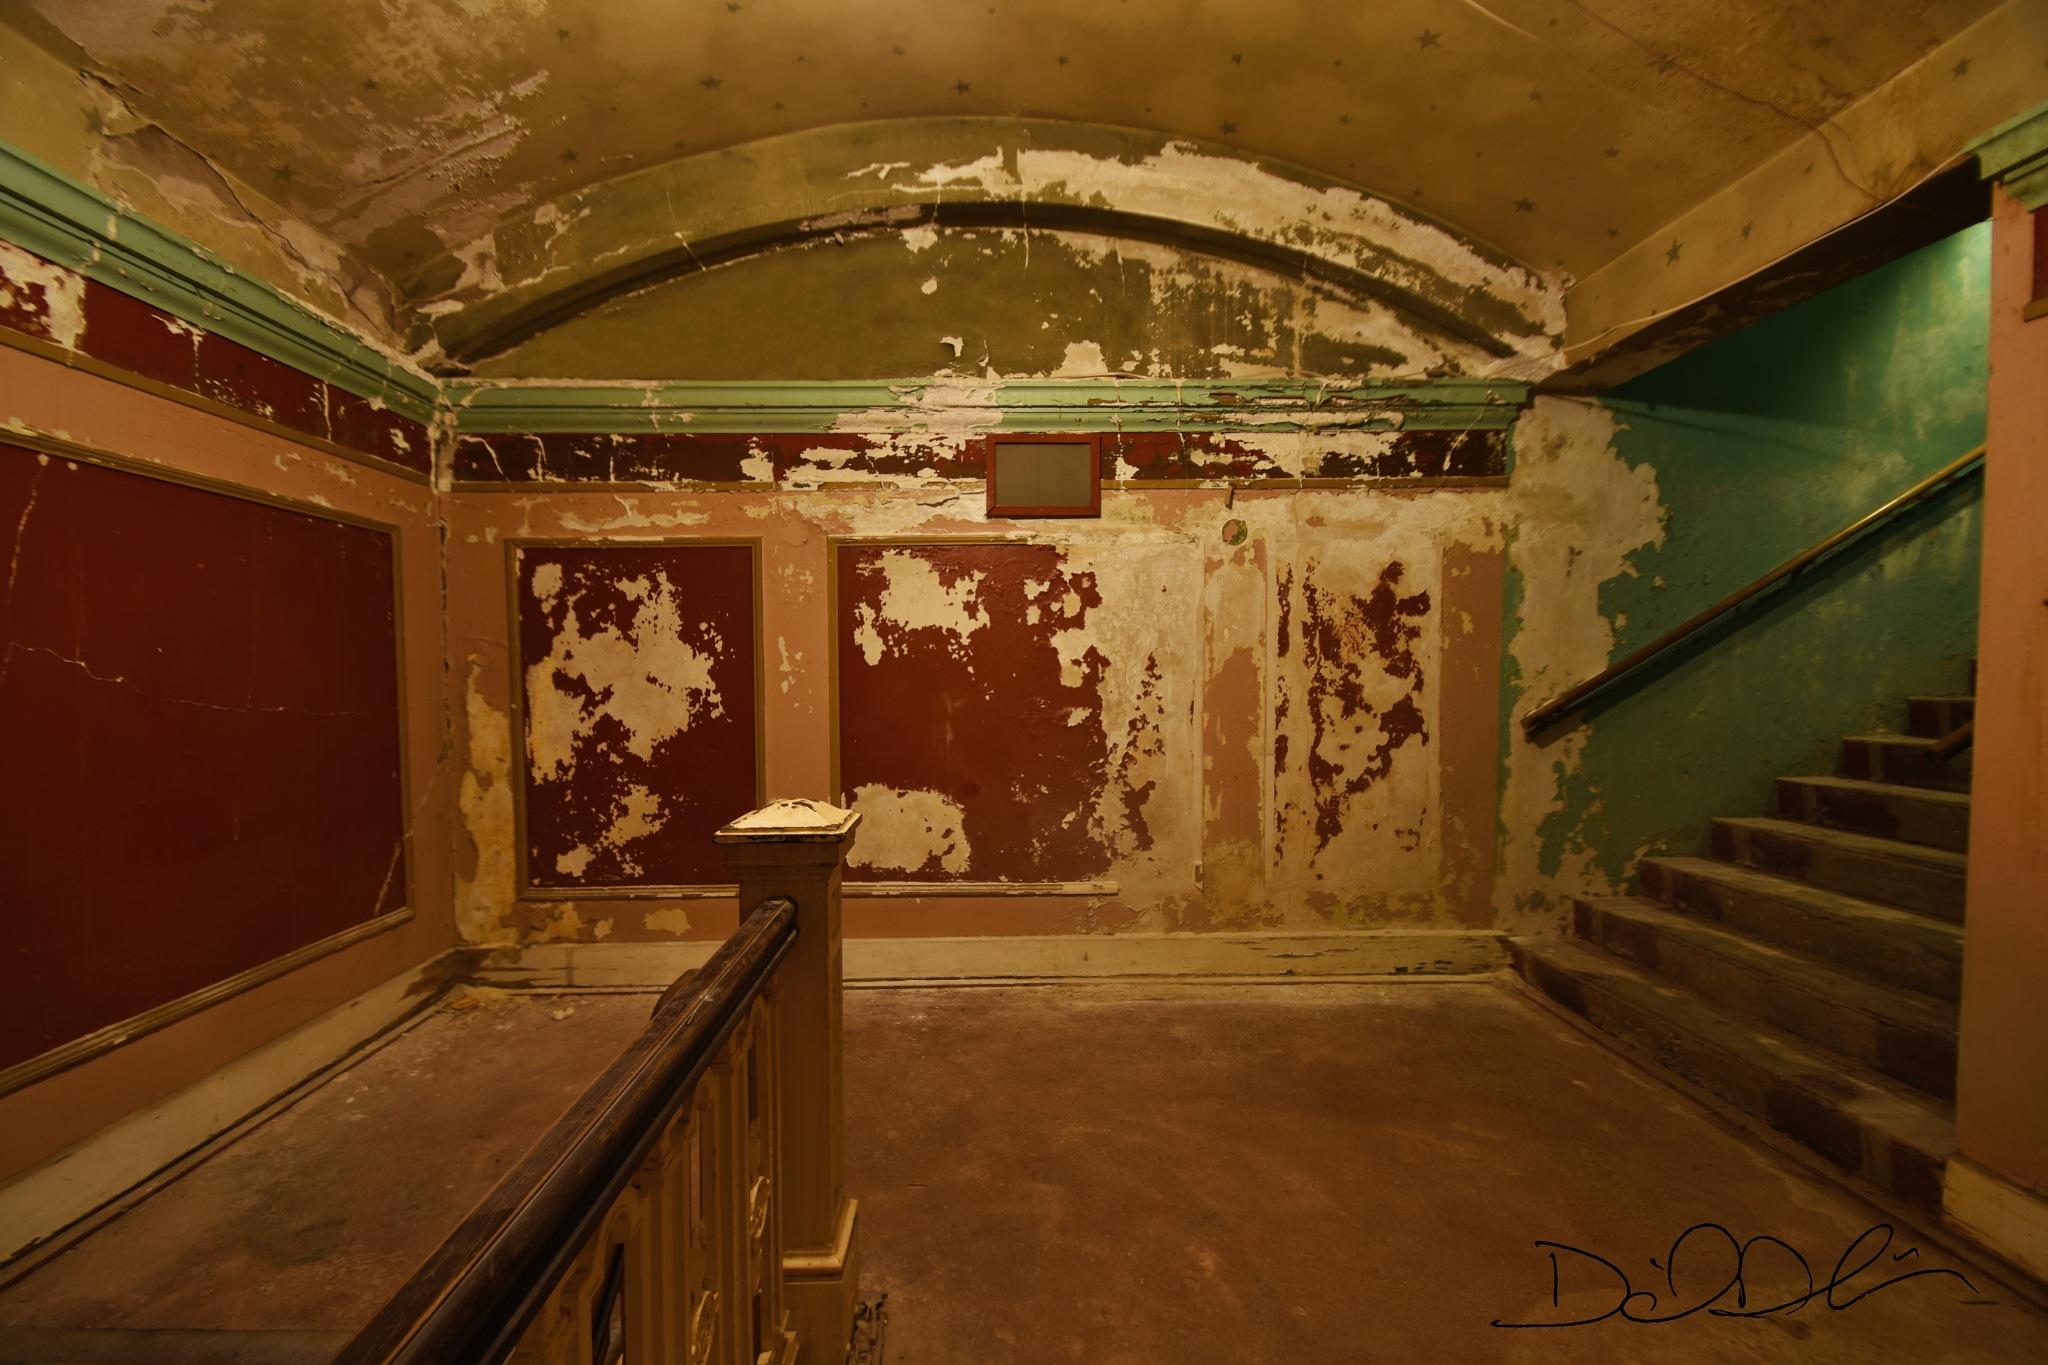 Jayhawk Theatre Upstair Hallway by Daniel Dubois